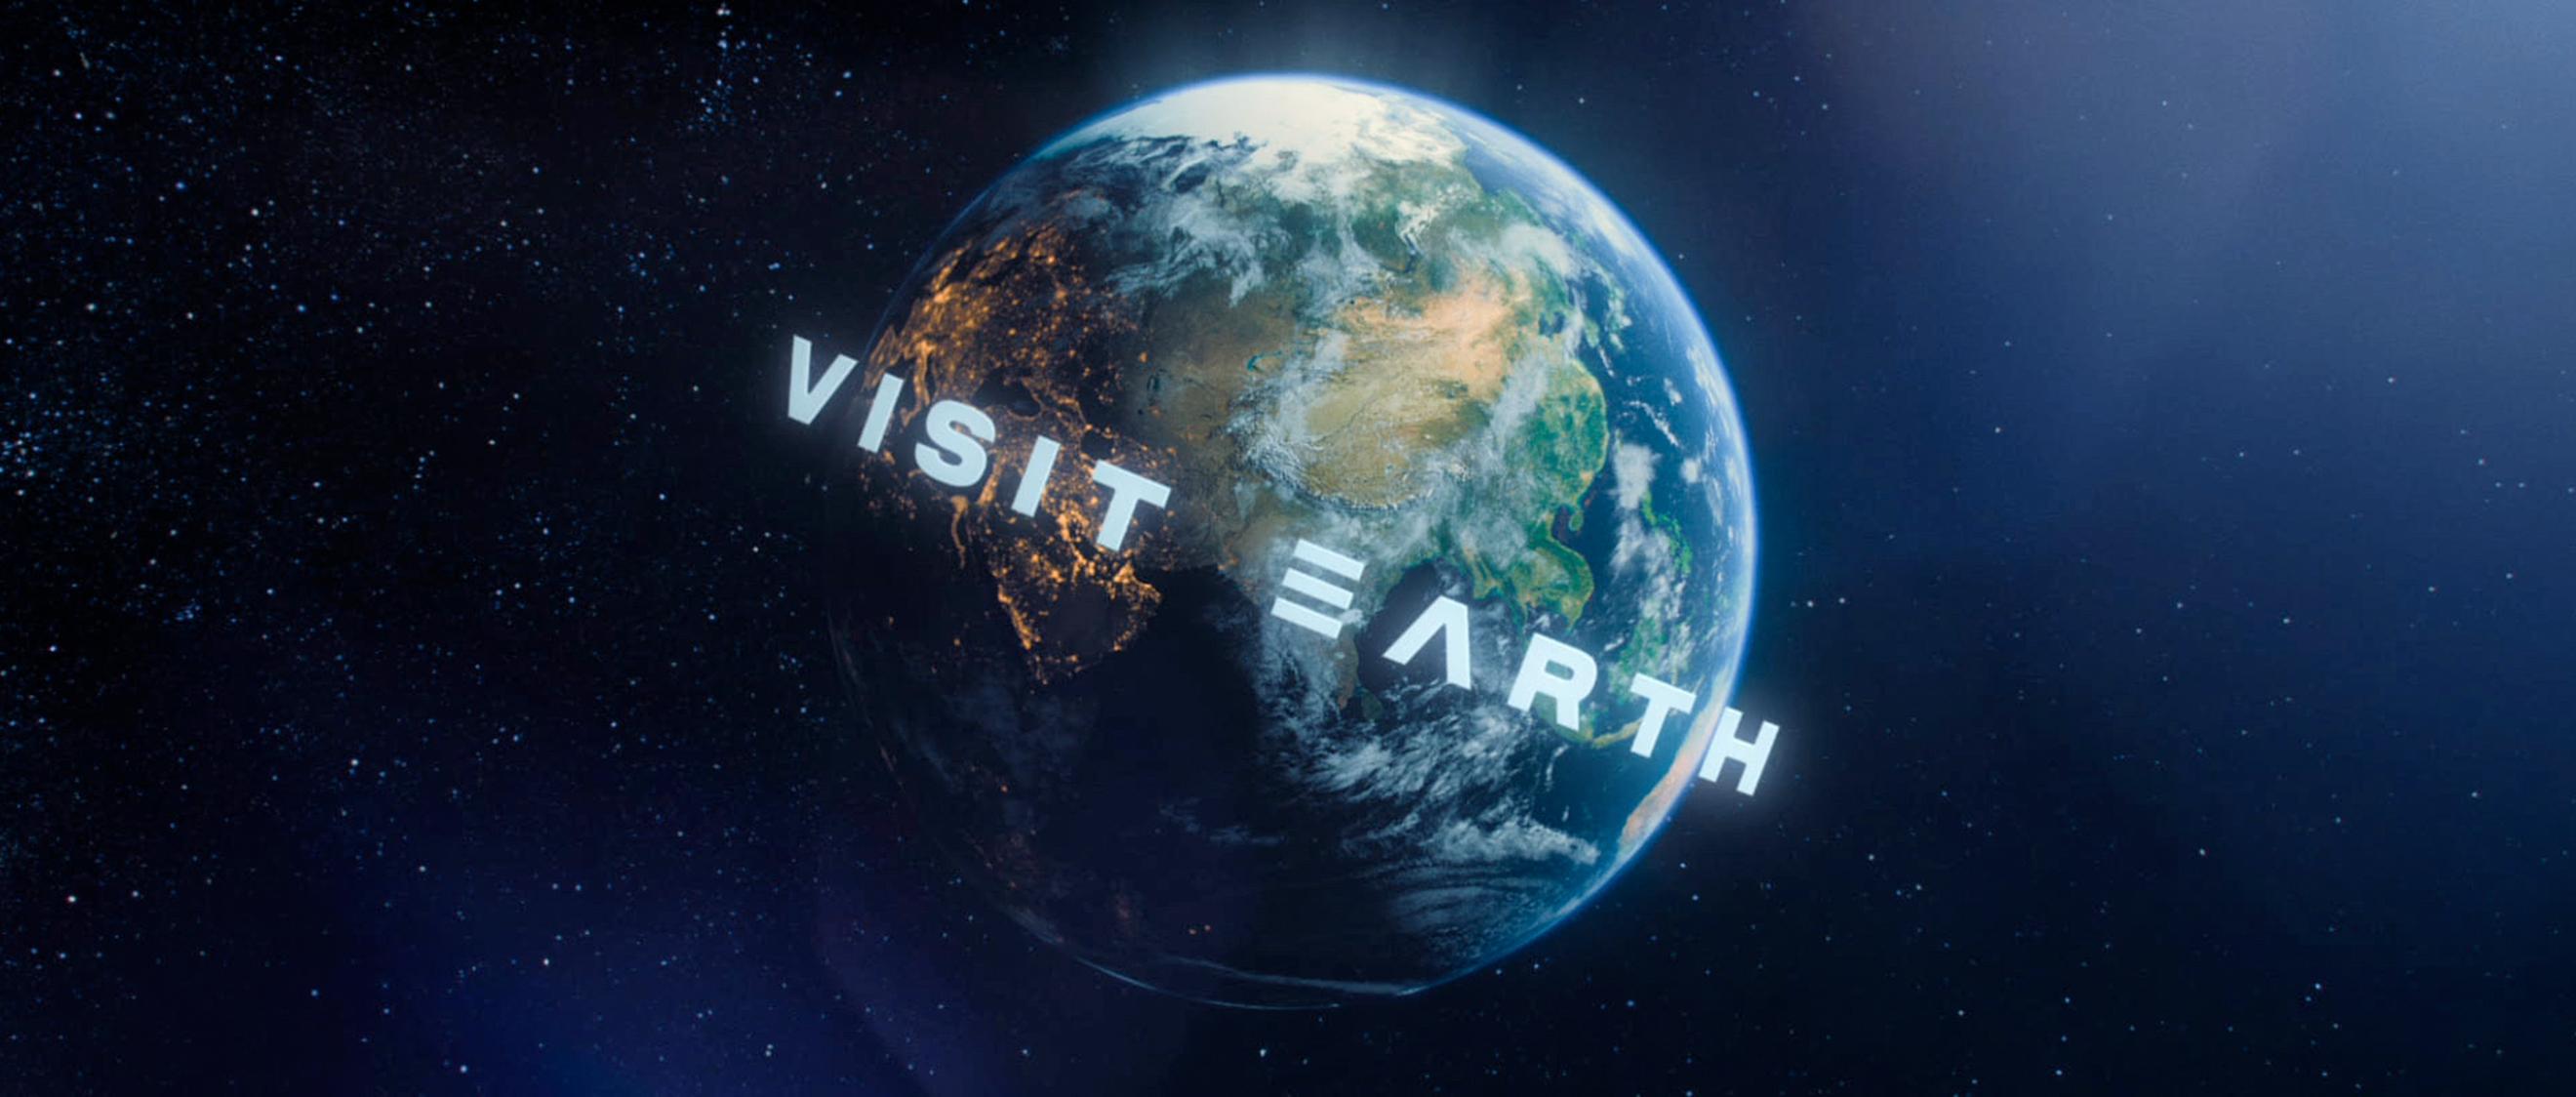 Visit Earth